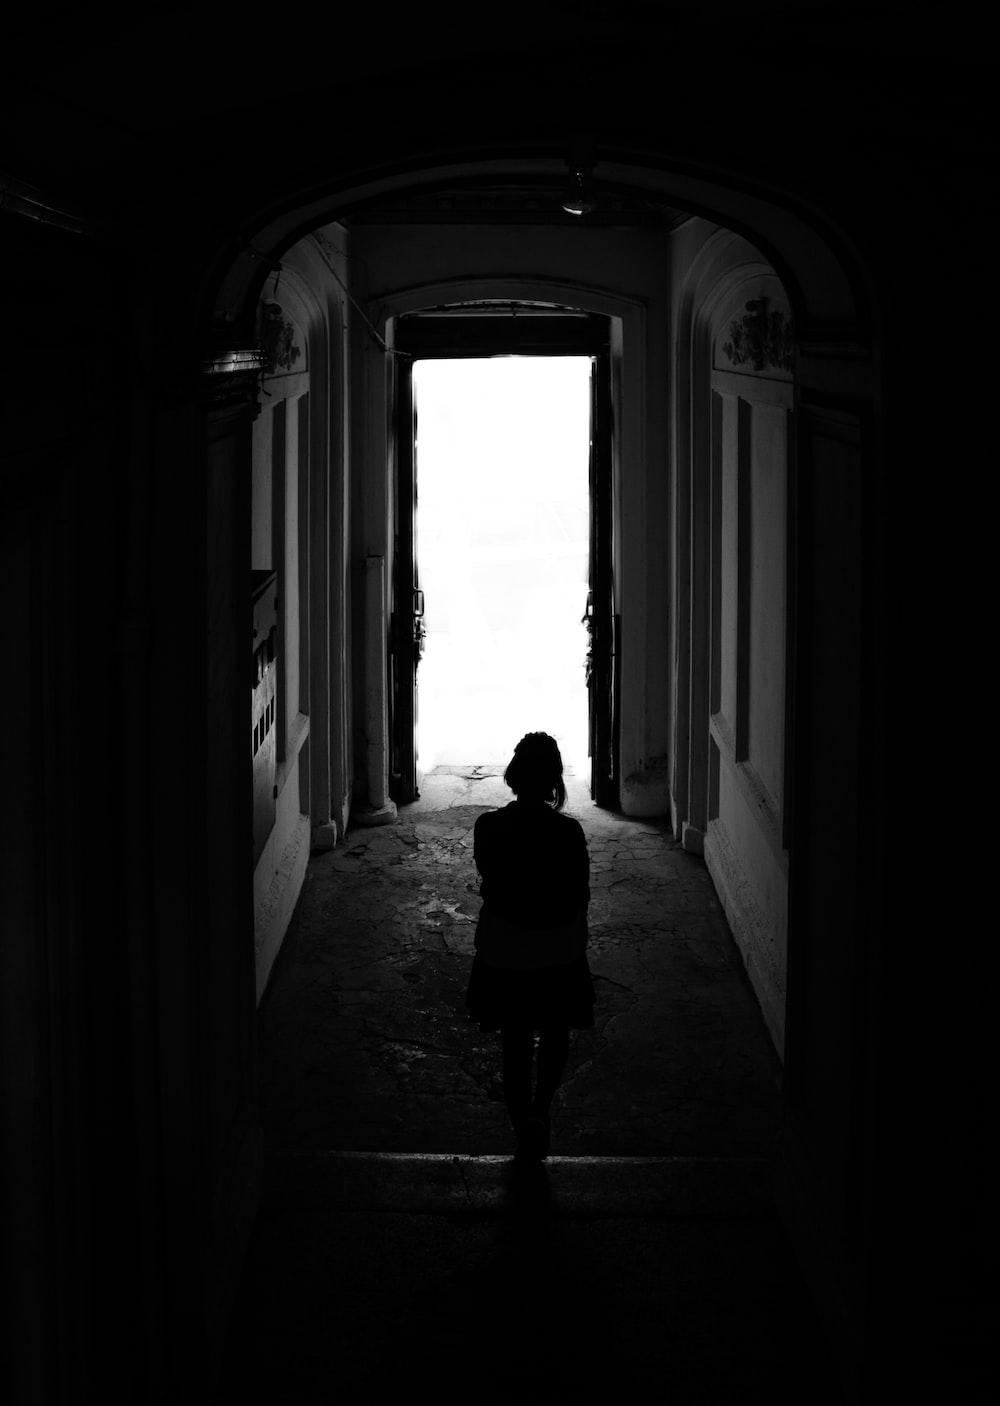 silhouette of woman walking on hallway